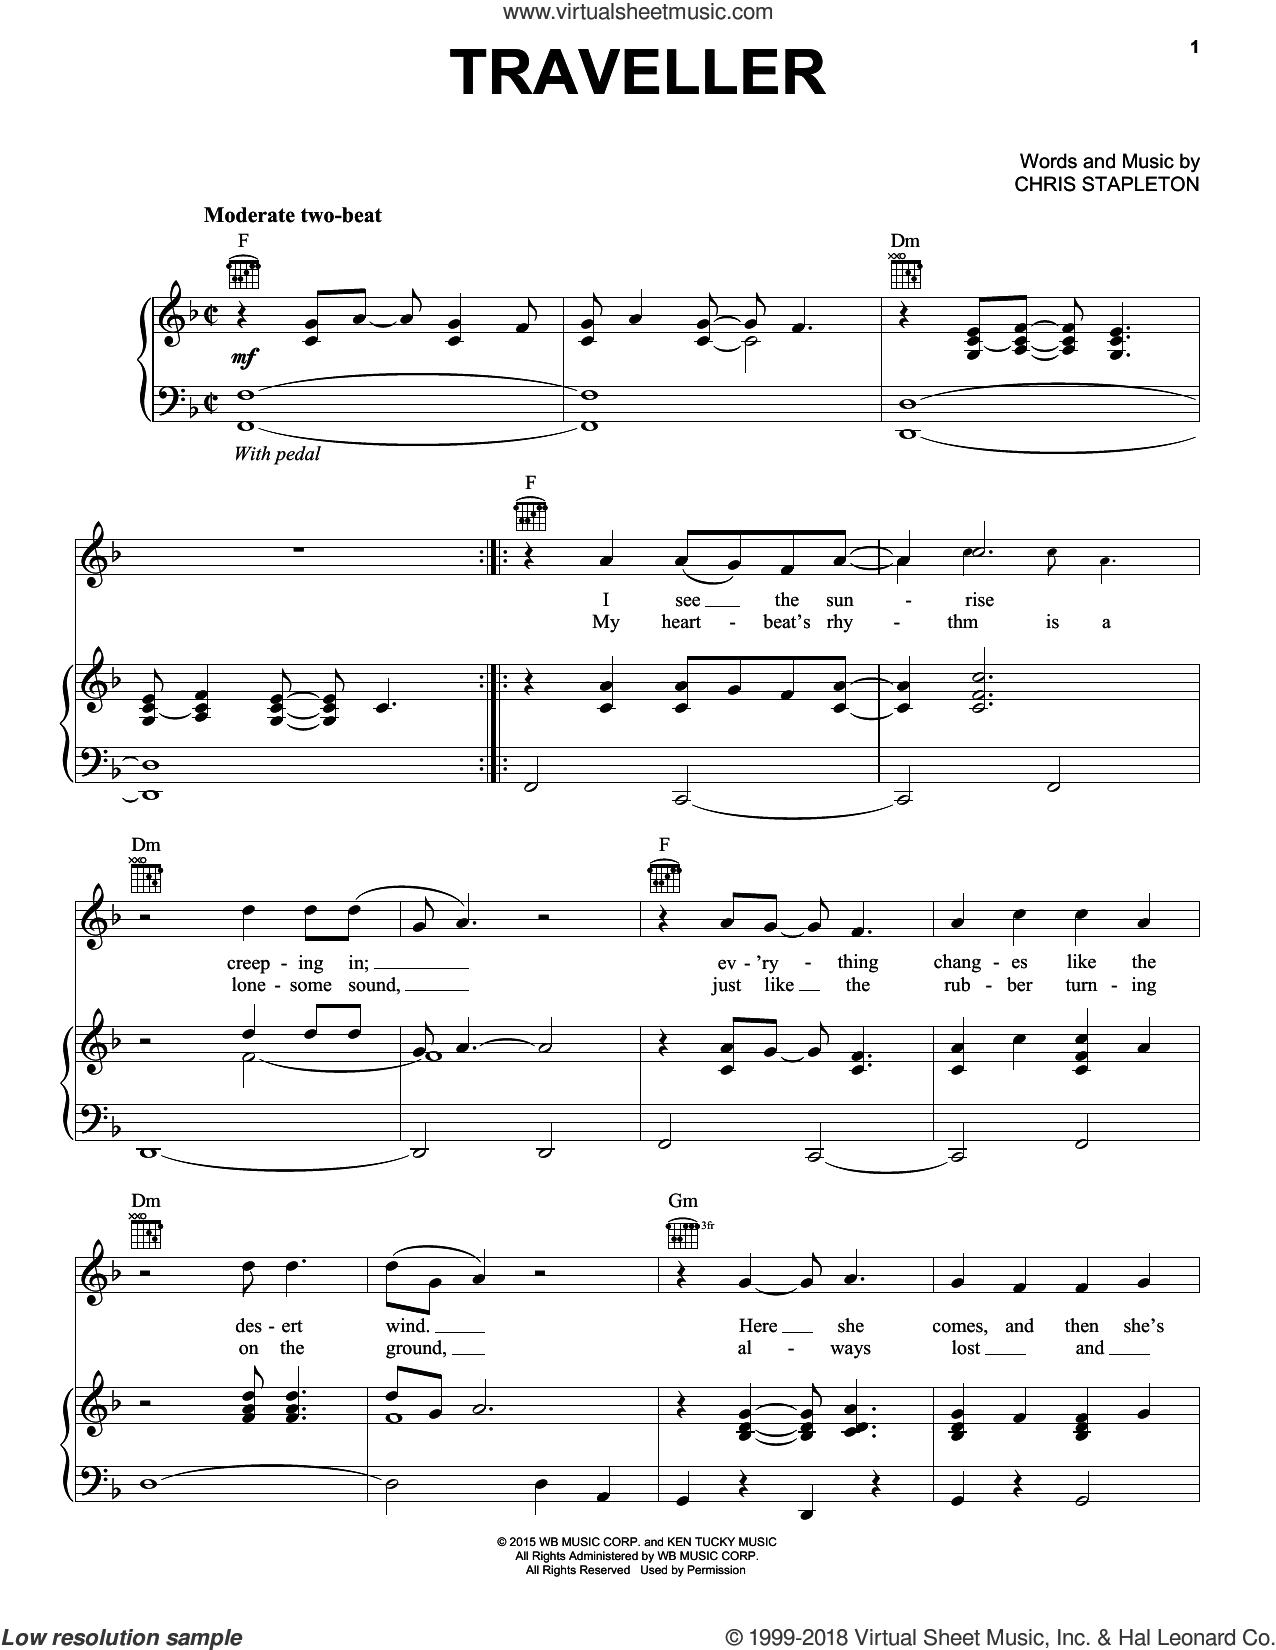 Traveller sheet music for voice, piano or guitar by Chris Stapleton, intermediate skill level